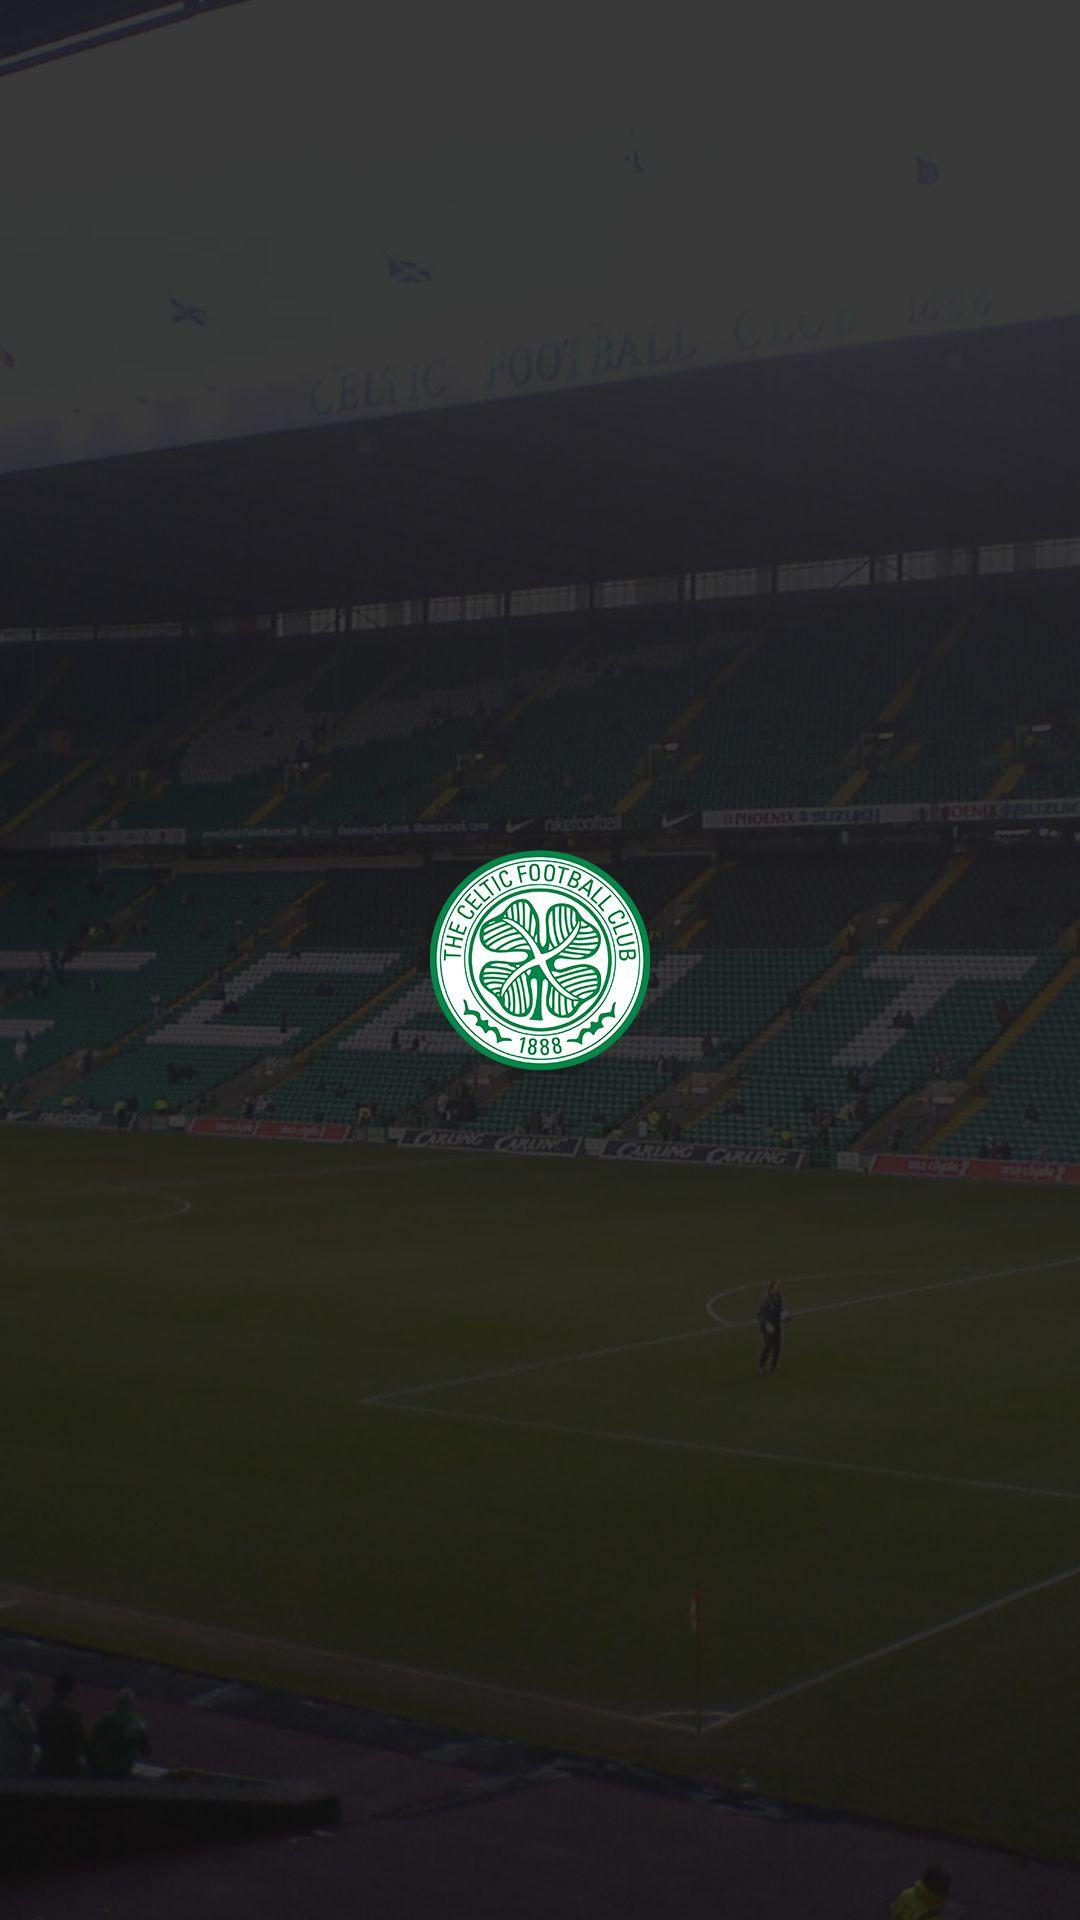 Celtic Fc wallpaper